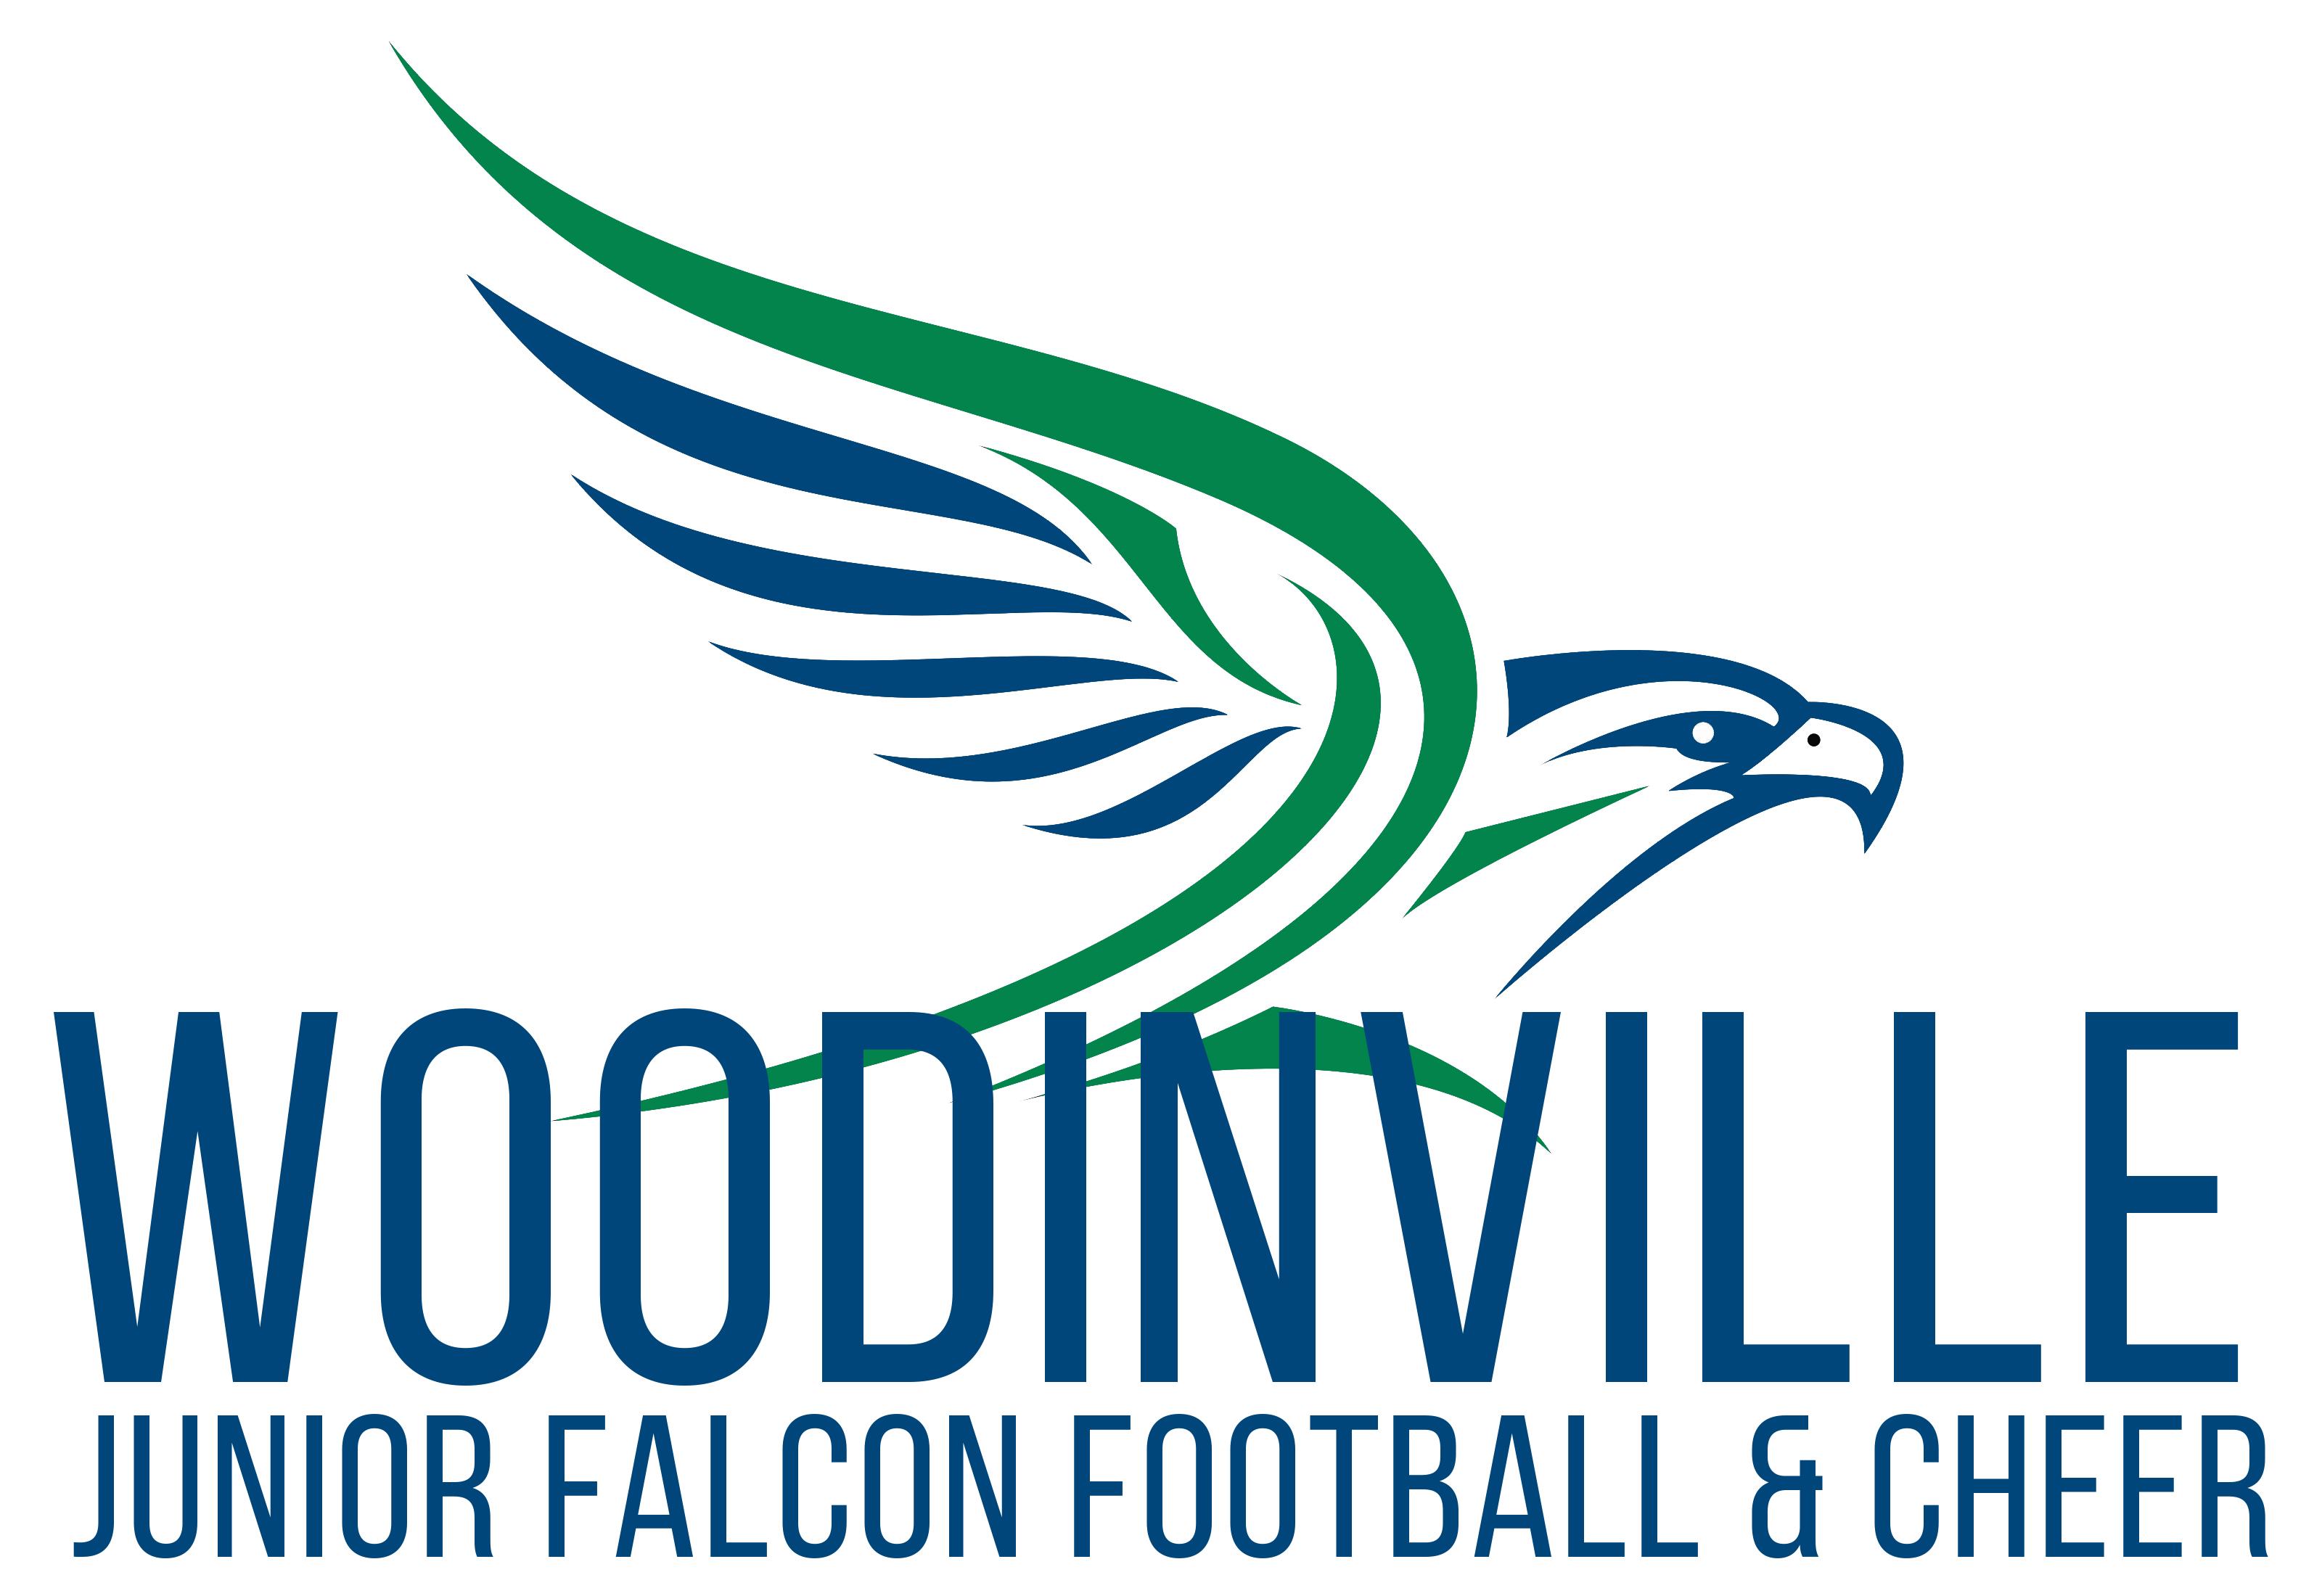 Woodinville Falcons Junior Football Association Logo